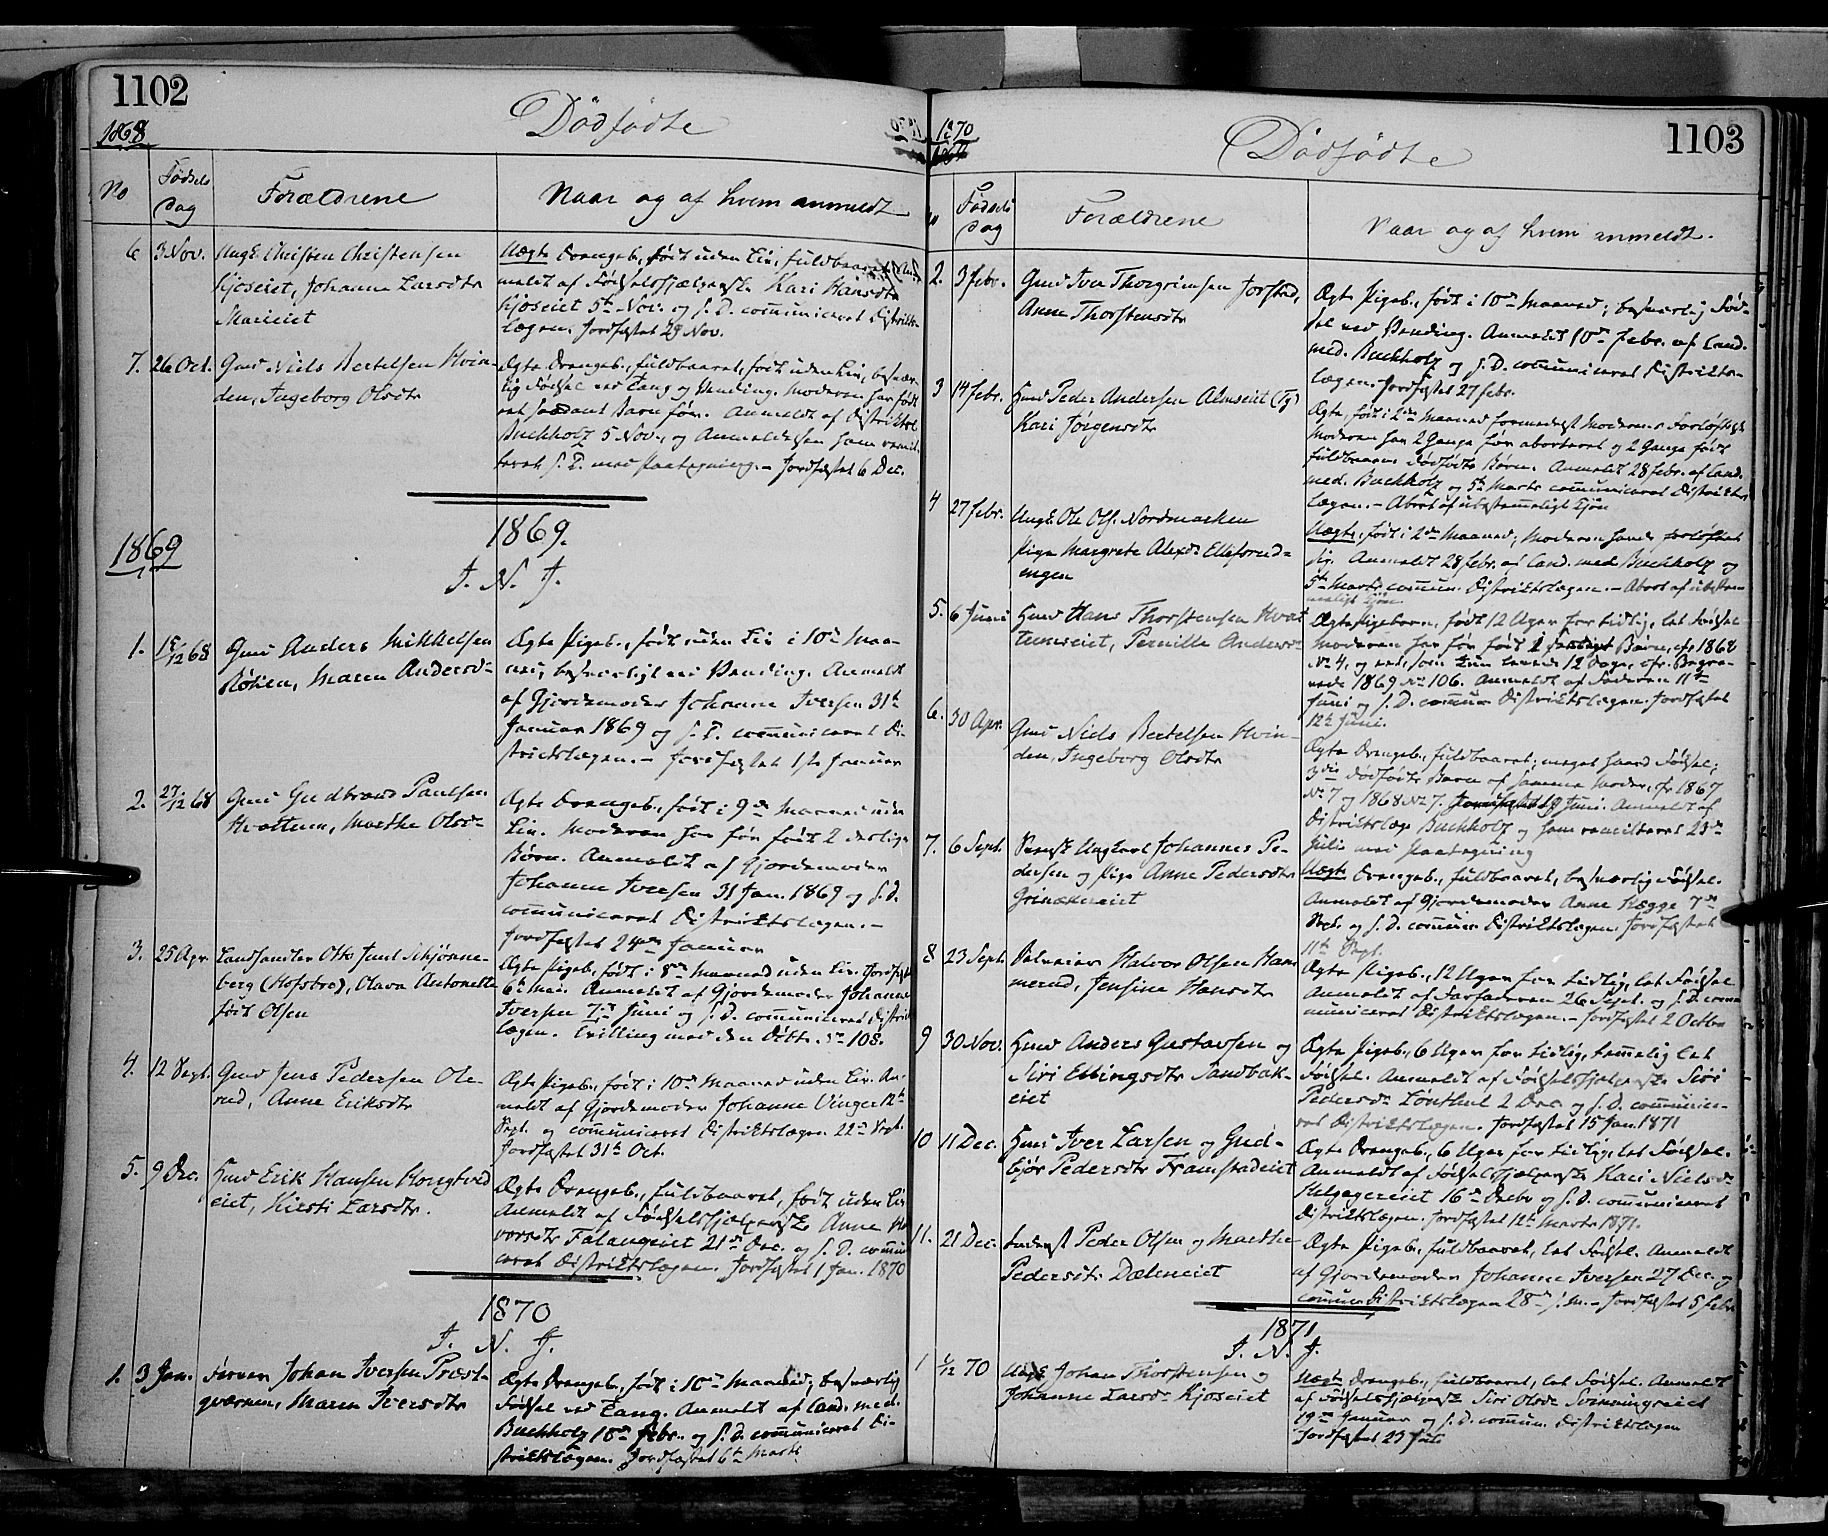 SAH, Gran prestekontor, Ministerialbok nr. 12, 1856-1874, s. 1102-1103